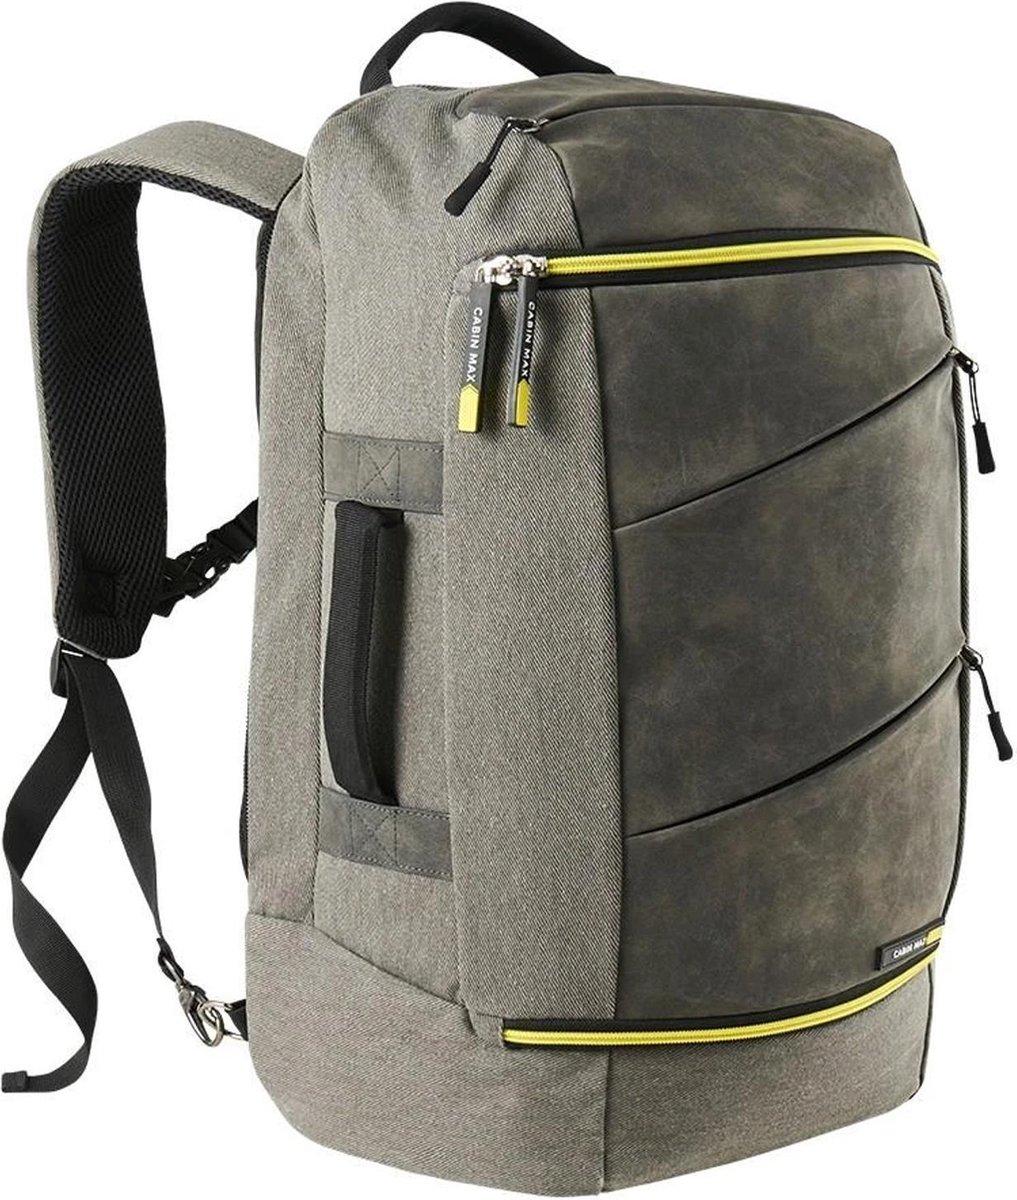 CabinMax Manhatten   Handbagage 38L   Rugzak   Compact Reistas   Lichtgewicht   Grijs/Geel